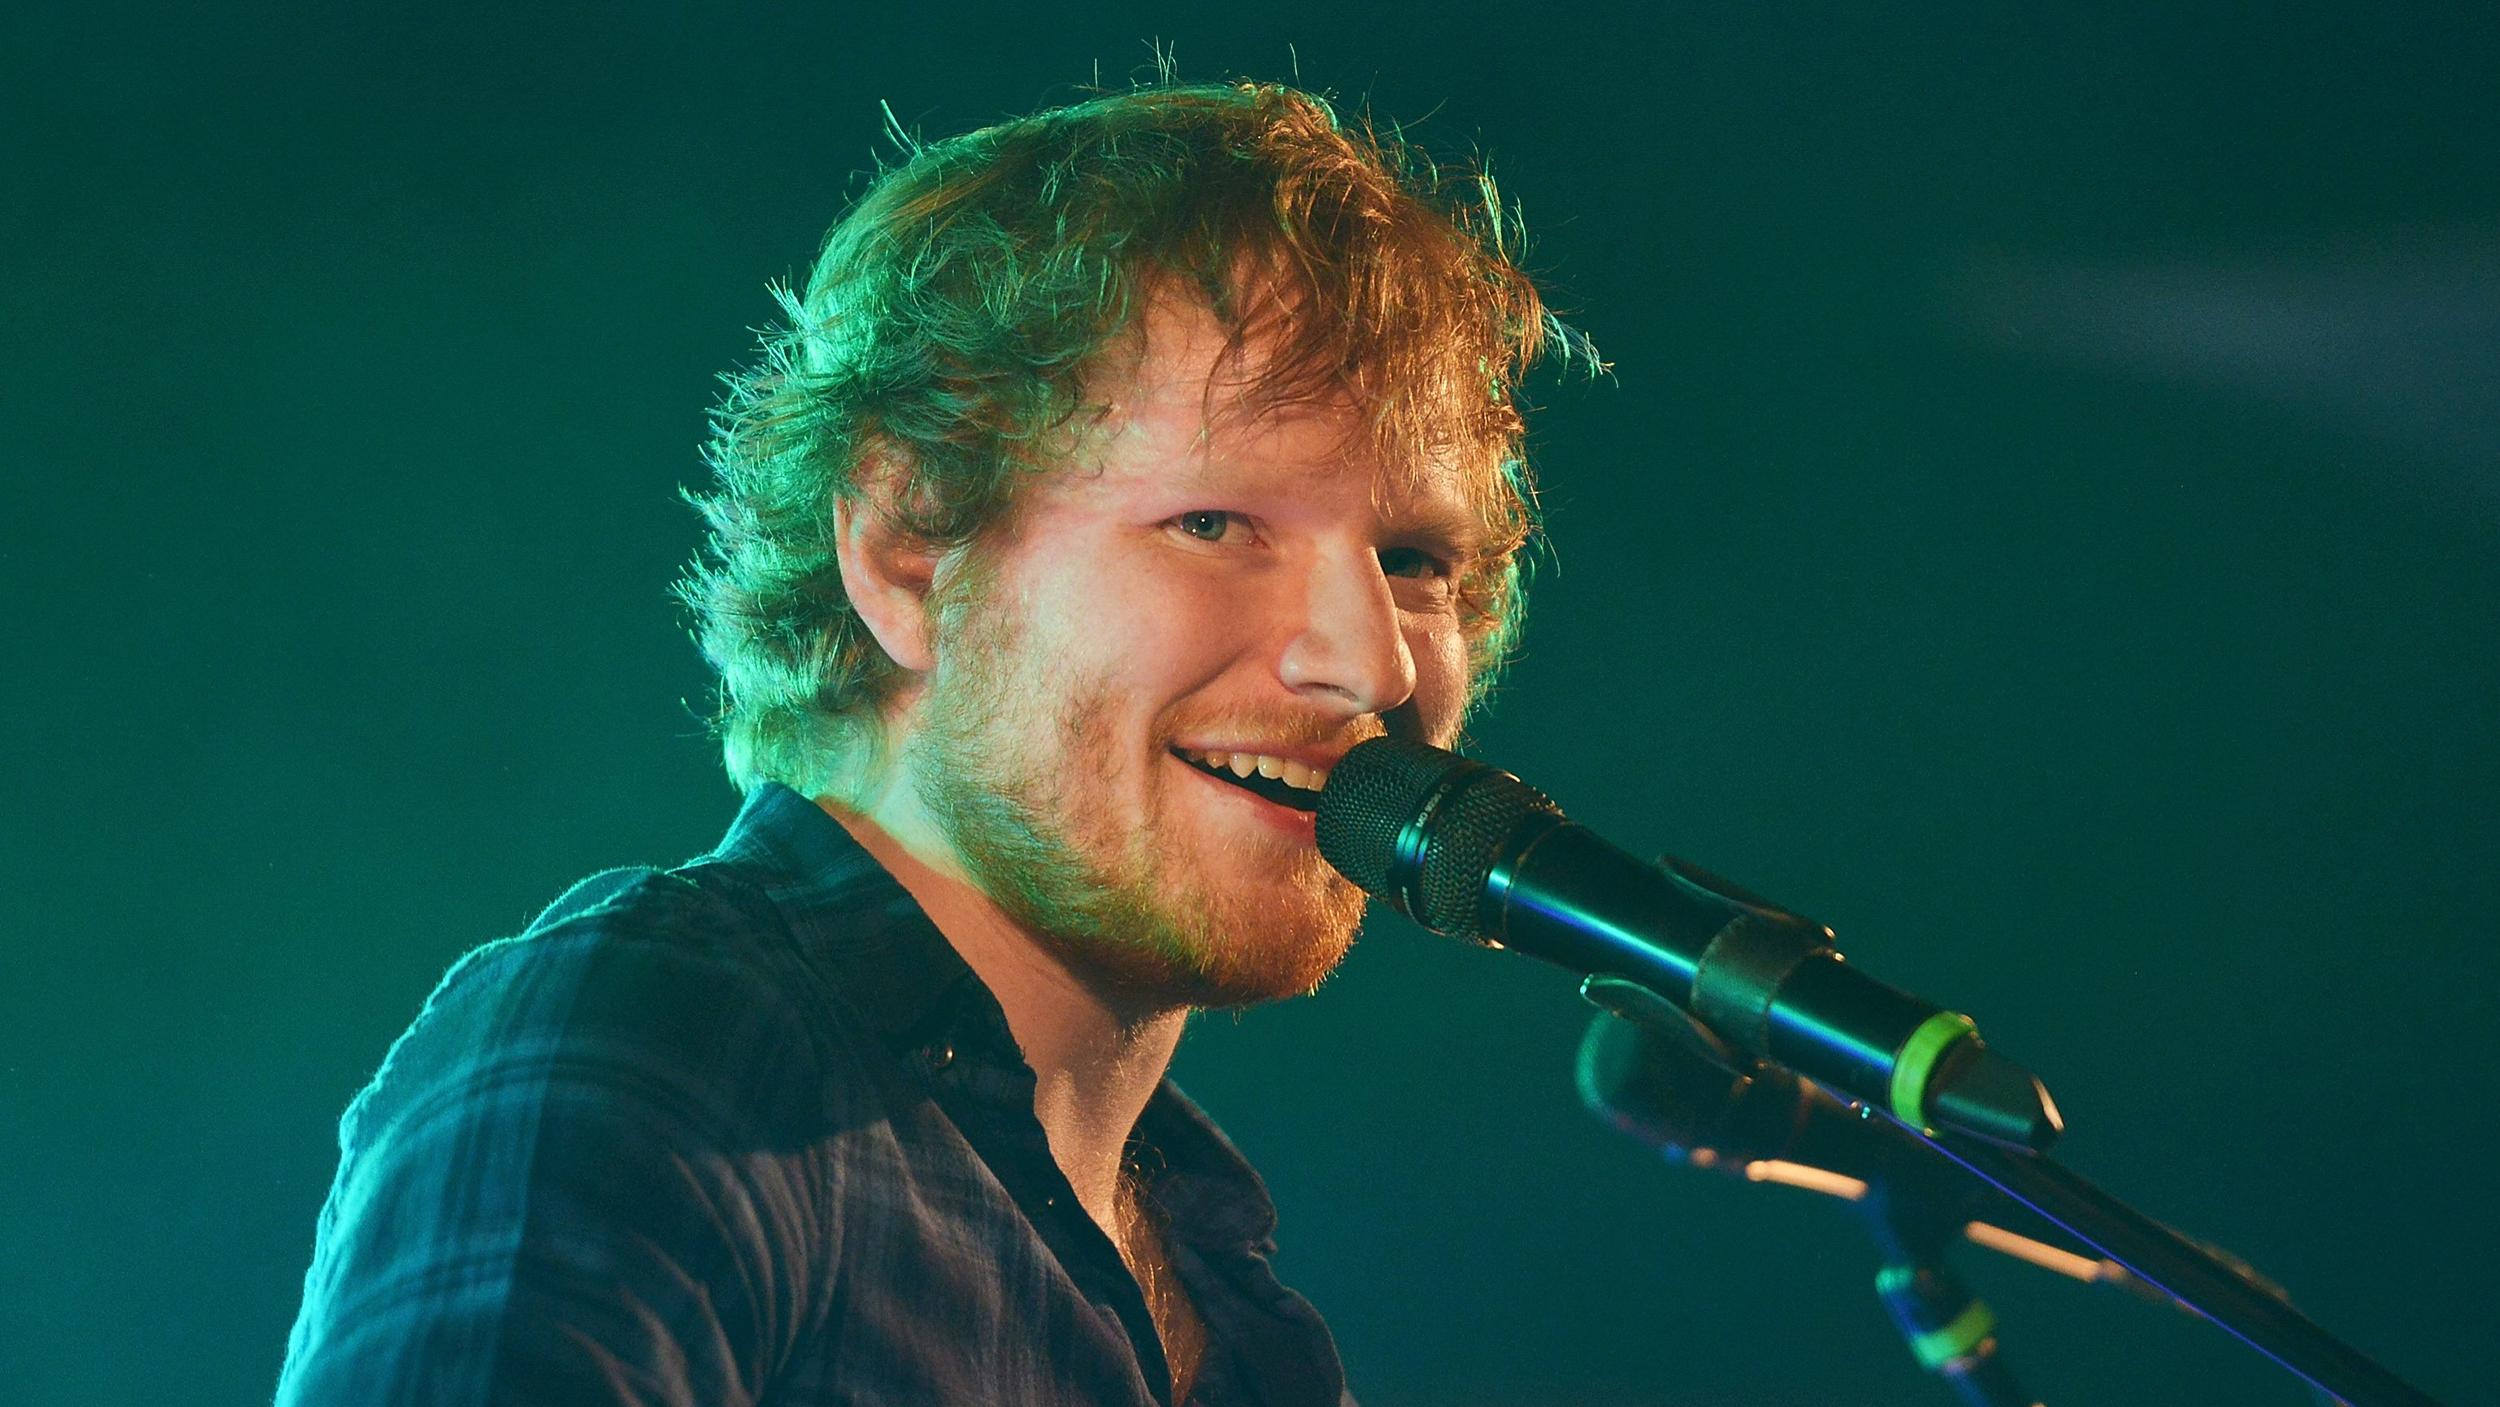 Ed Sheeran Computer Wallpaper